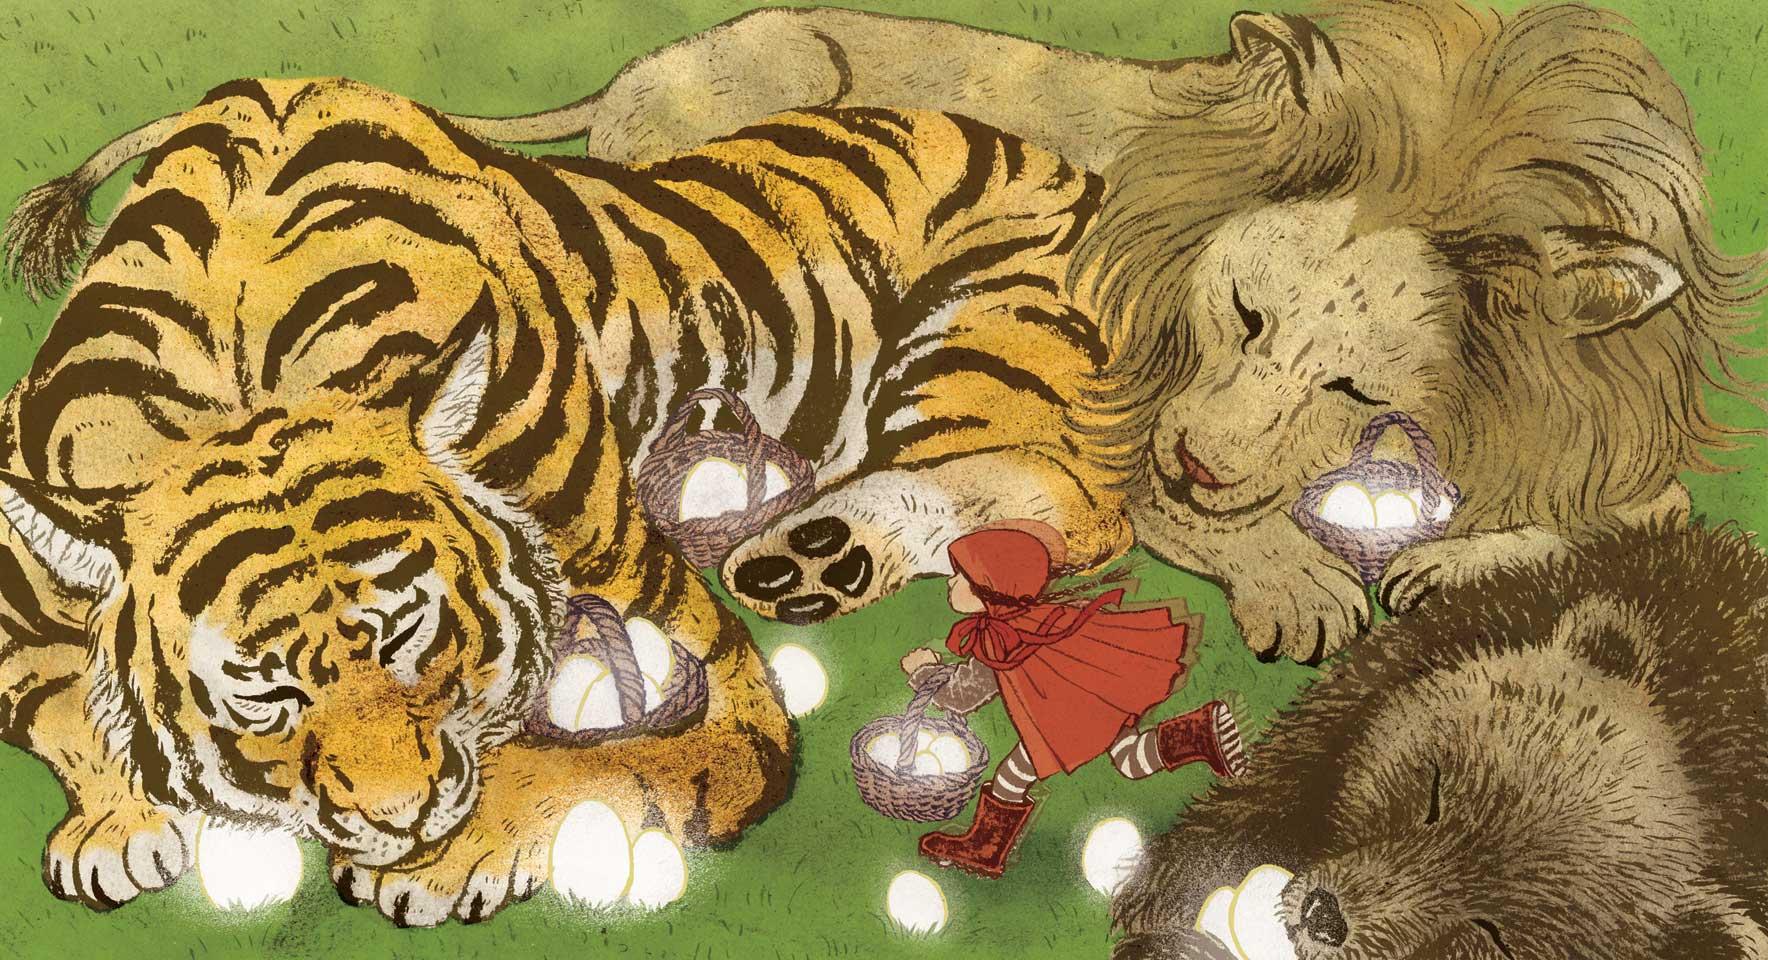 https://i1.wp.com/yukoart.com/wp-content/uploads/2012/07/tiger_lion_bear.jpg